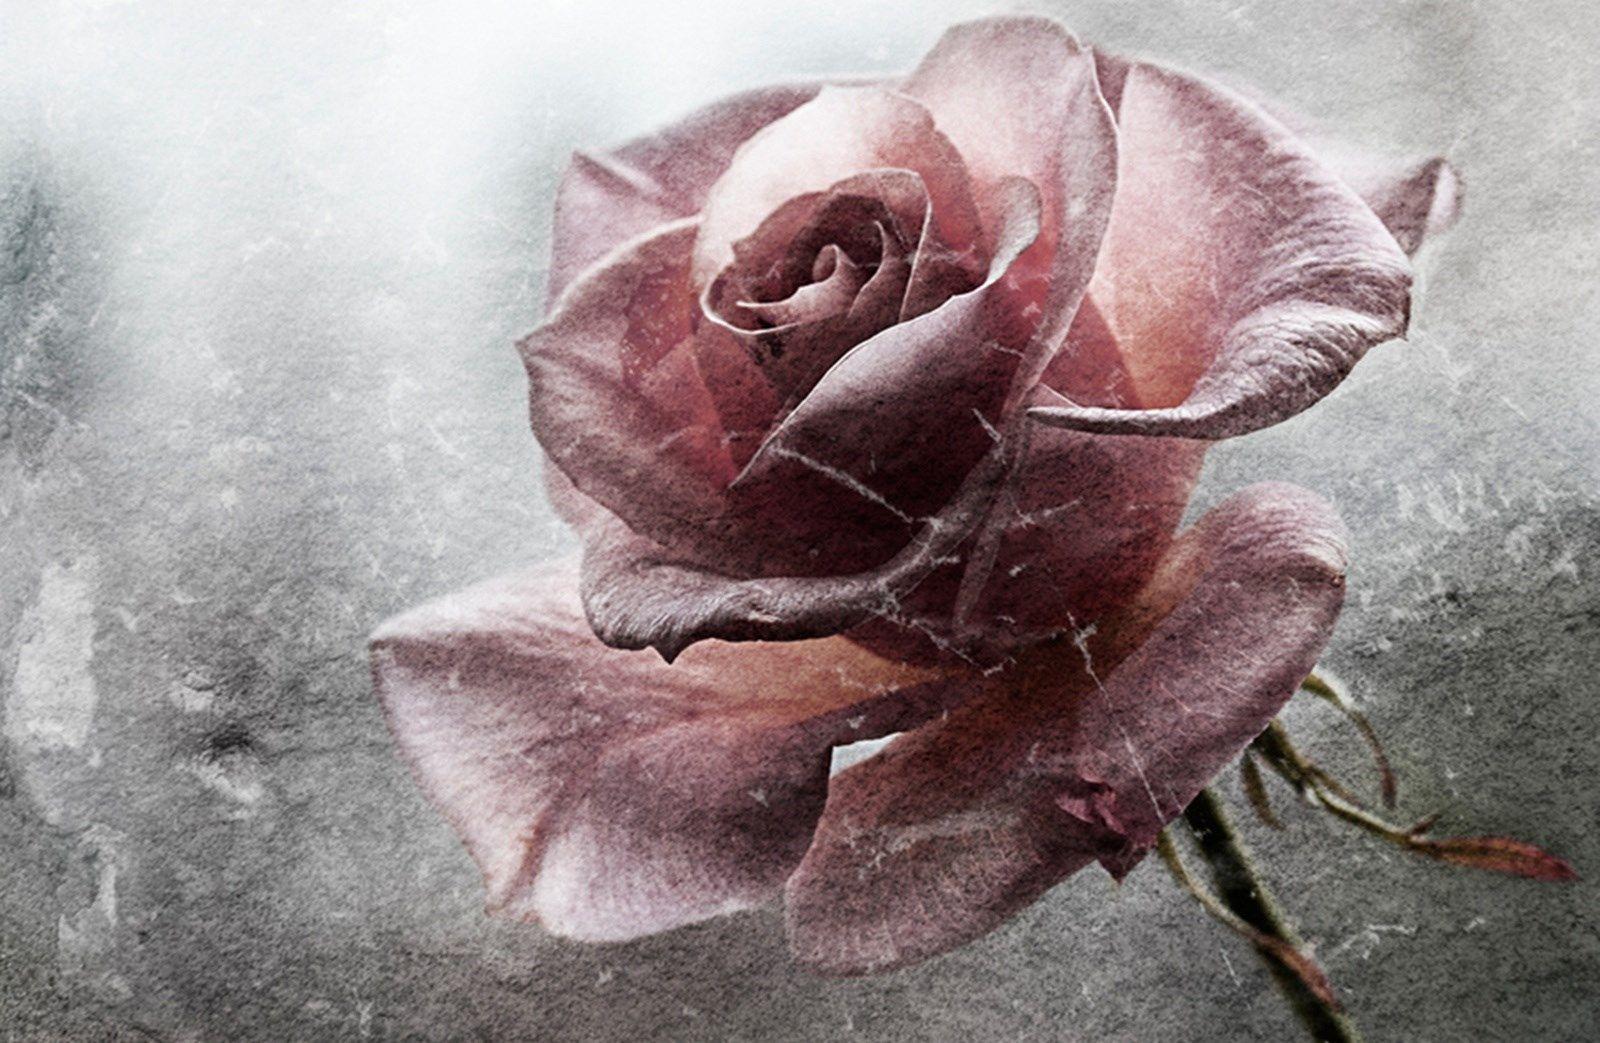 Xpx flower wallpaper for desktop background by branch mason